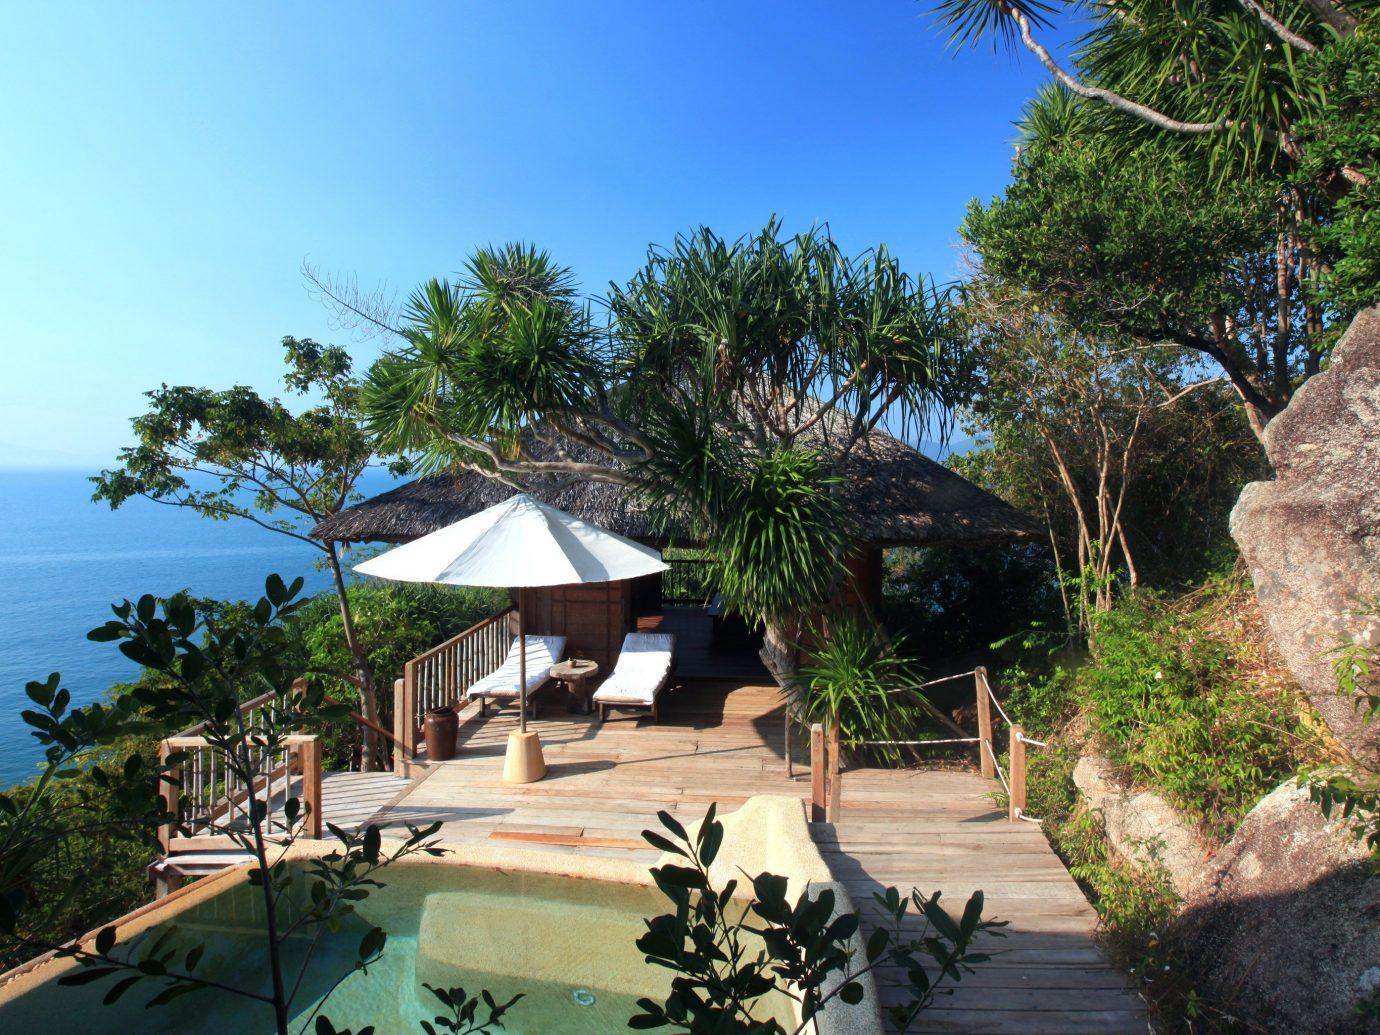 Hotels tree outdoor sky property Resort vacation palm estate plant tourism arecales Beach tropics Villa Village Jungle Sea bay